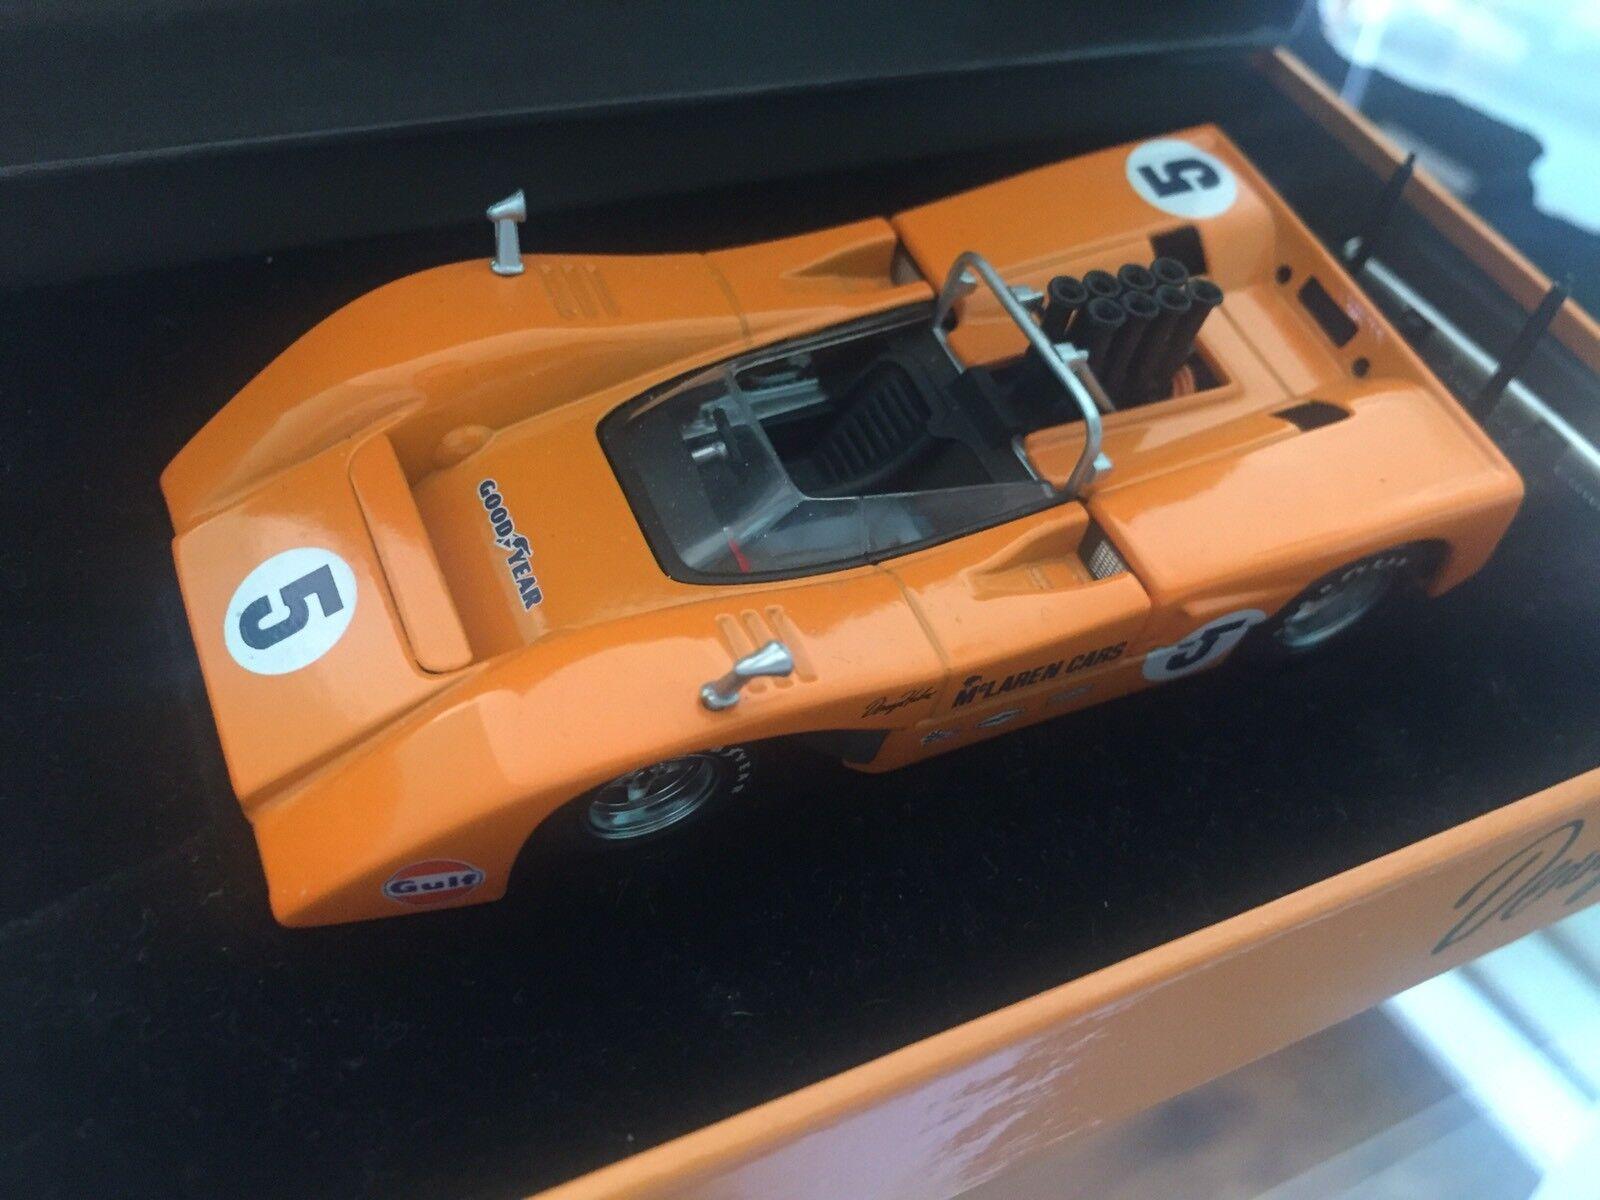 1 43 McLaren M8B Spark Minichamps  Ixo  prix bas 40%